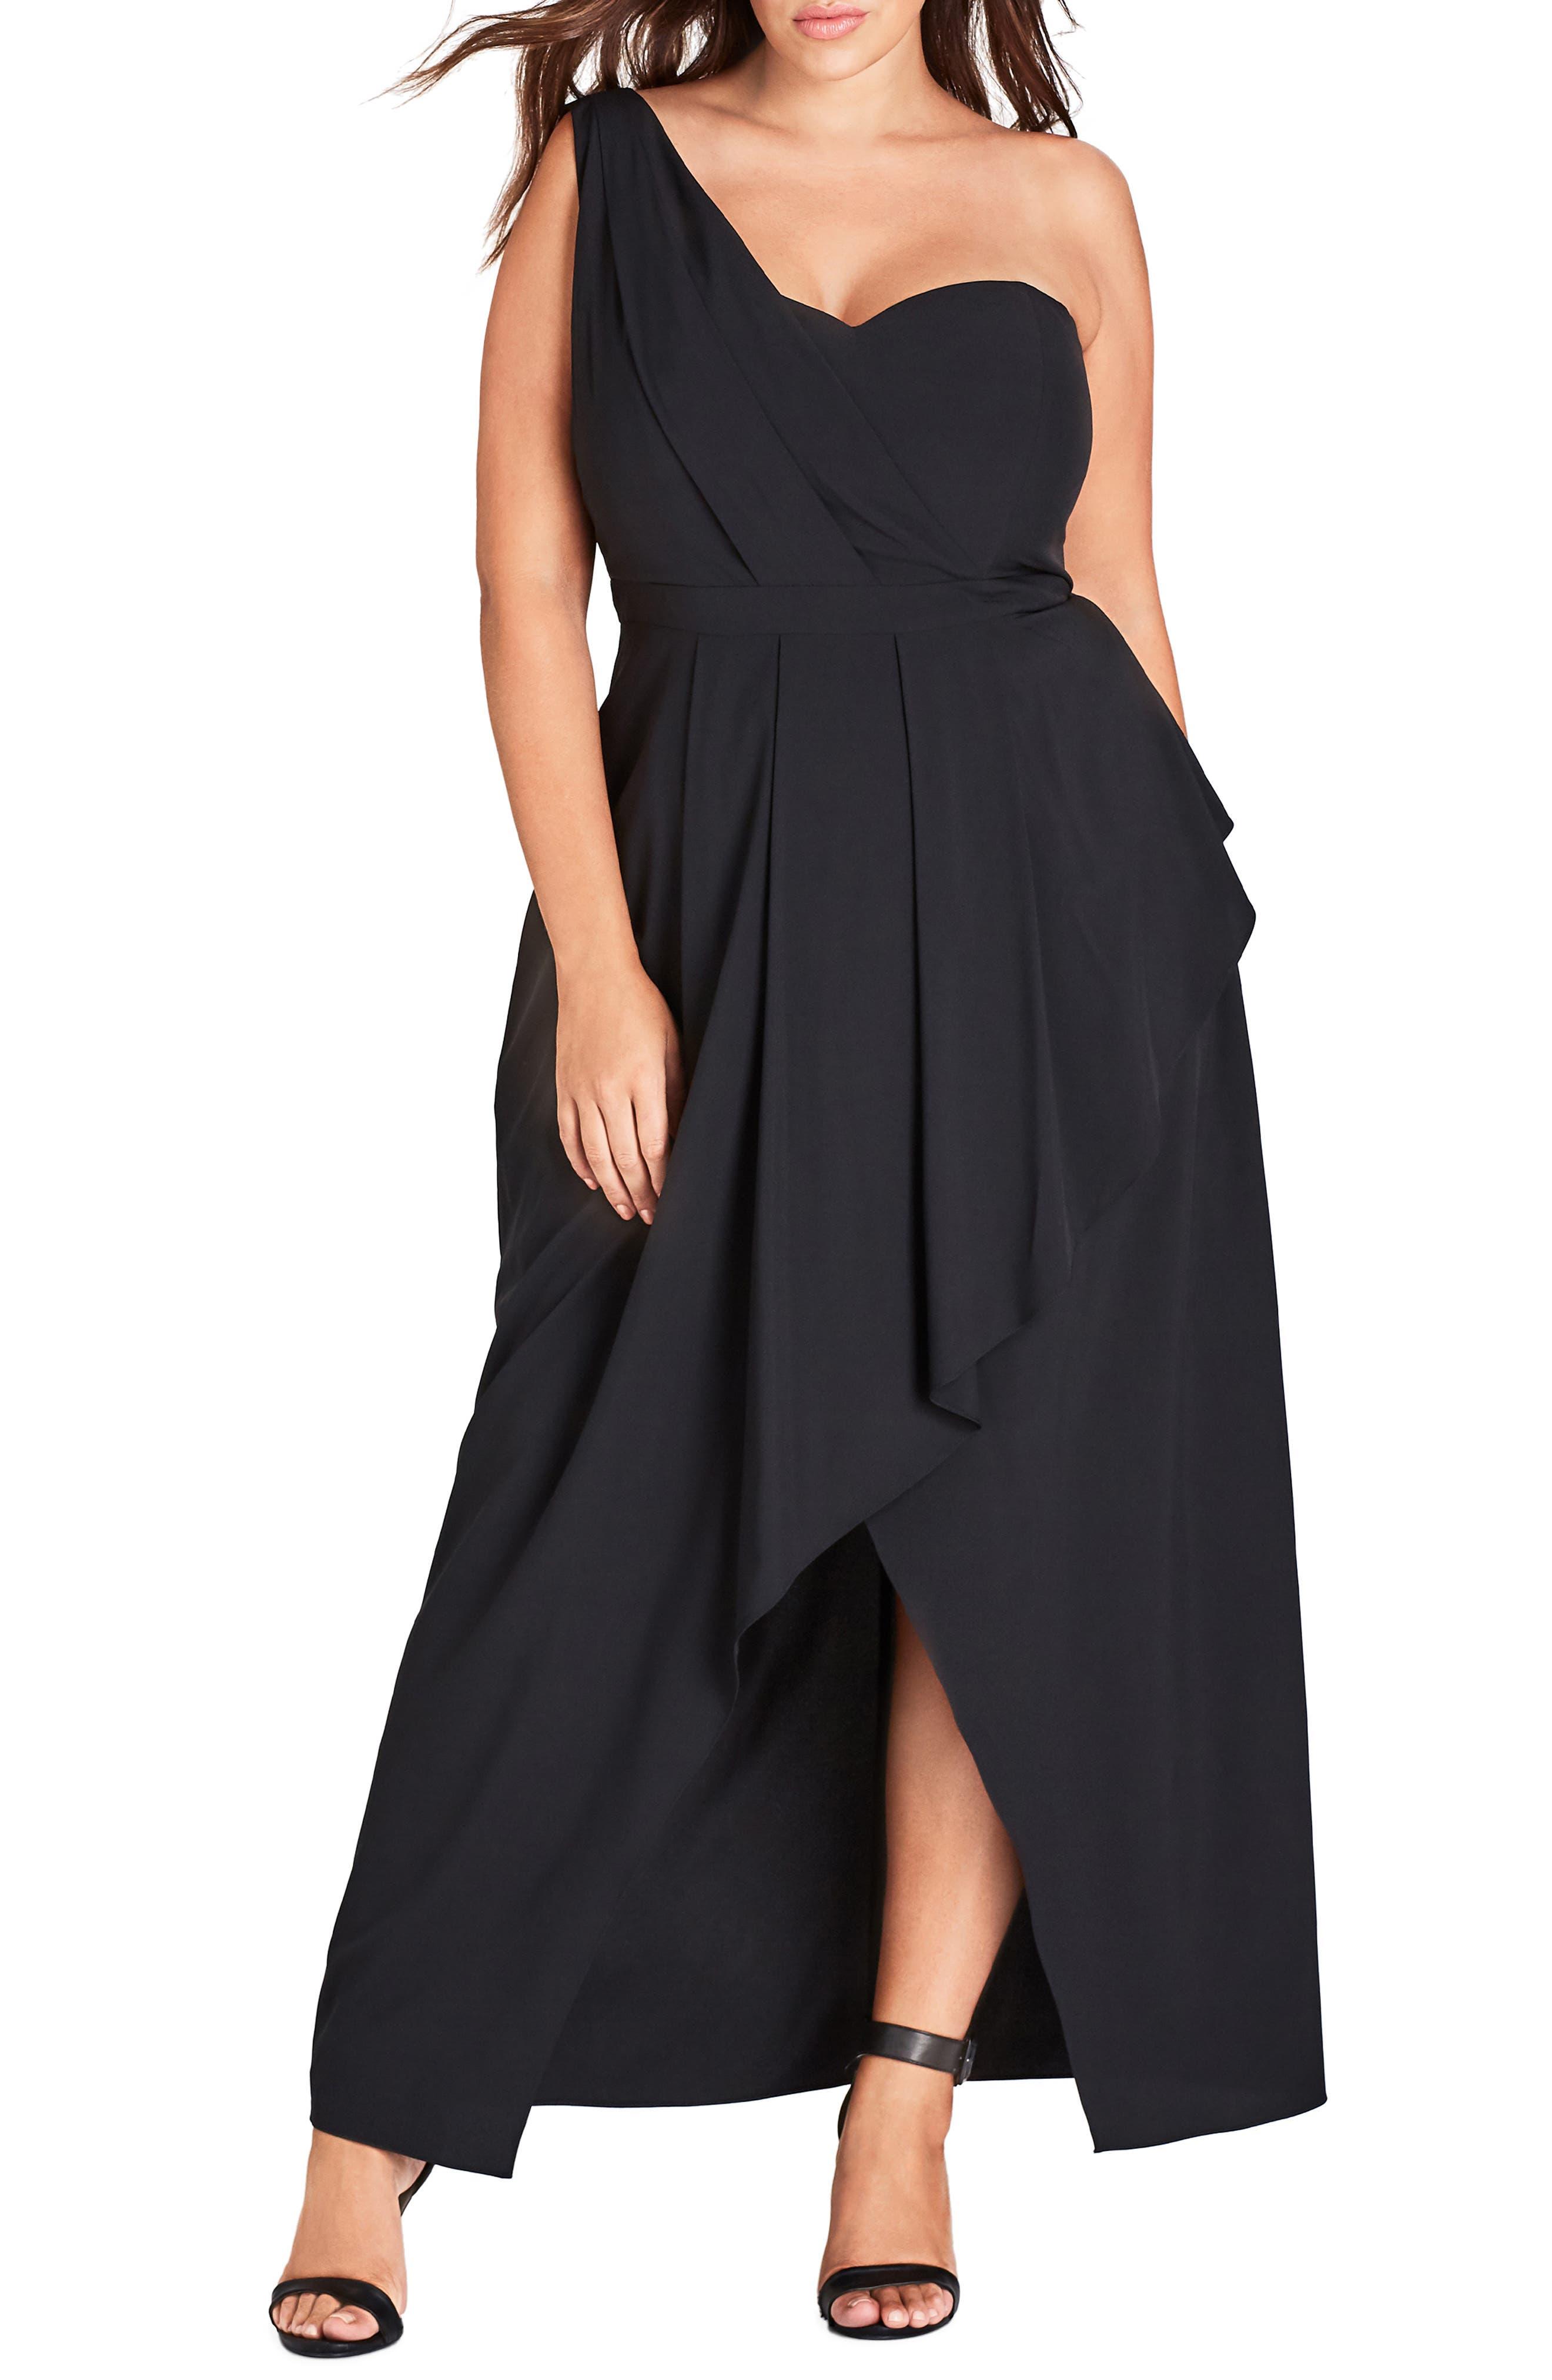 CITY CHIC Allure One-Shoulder Maxi Dress, Main, color, BLACK